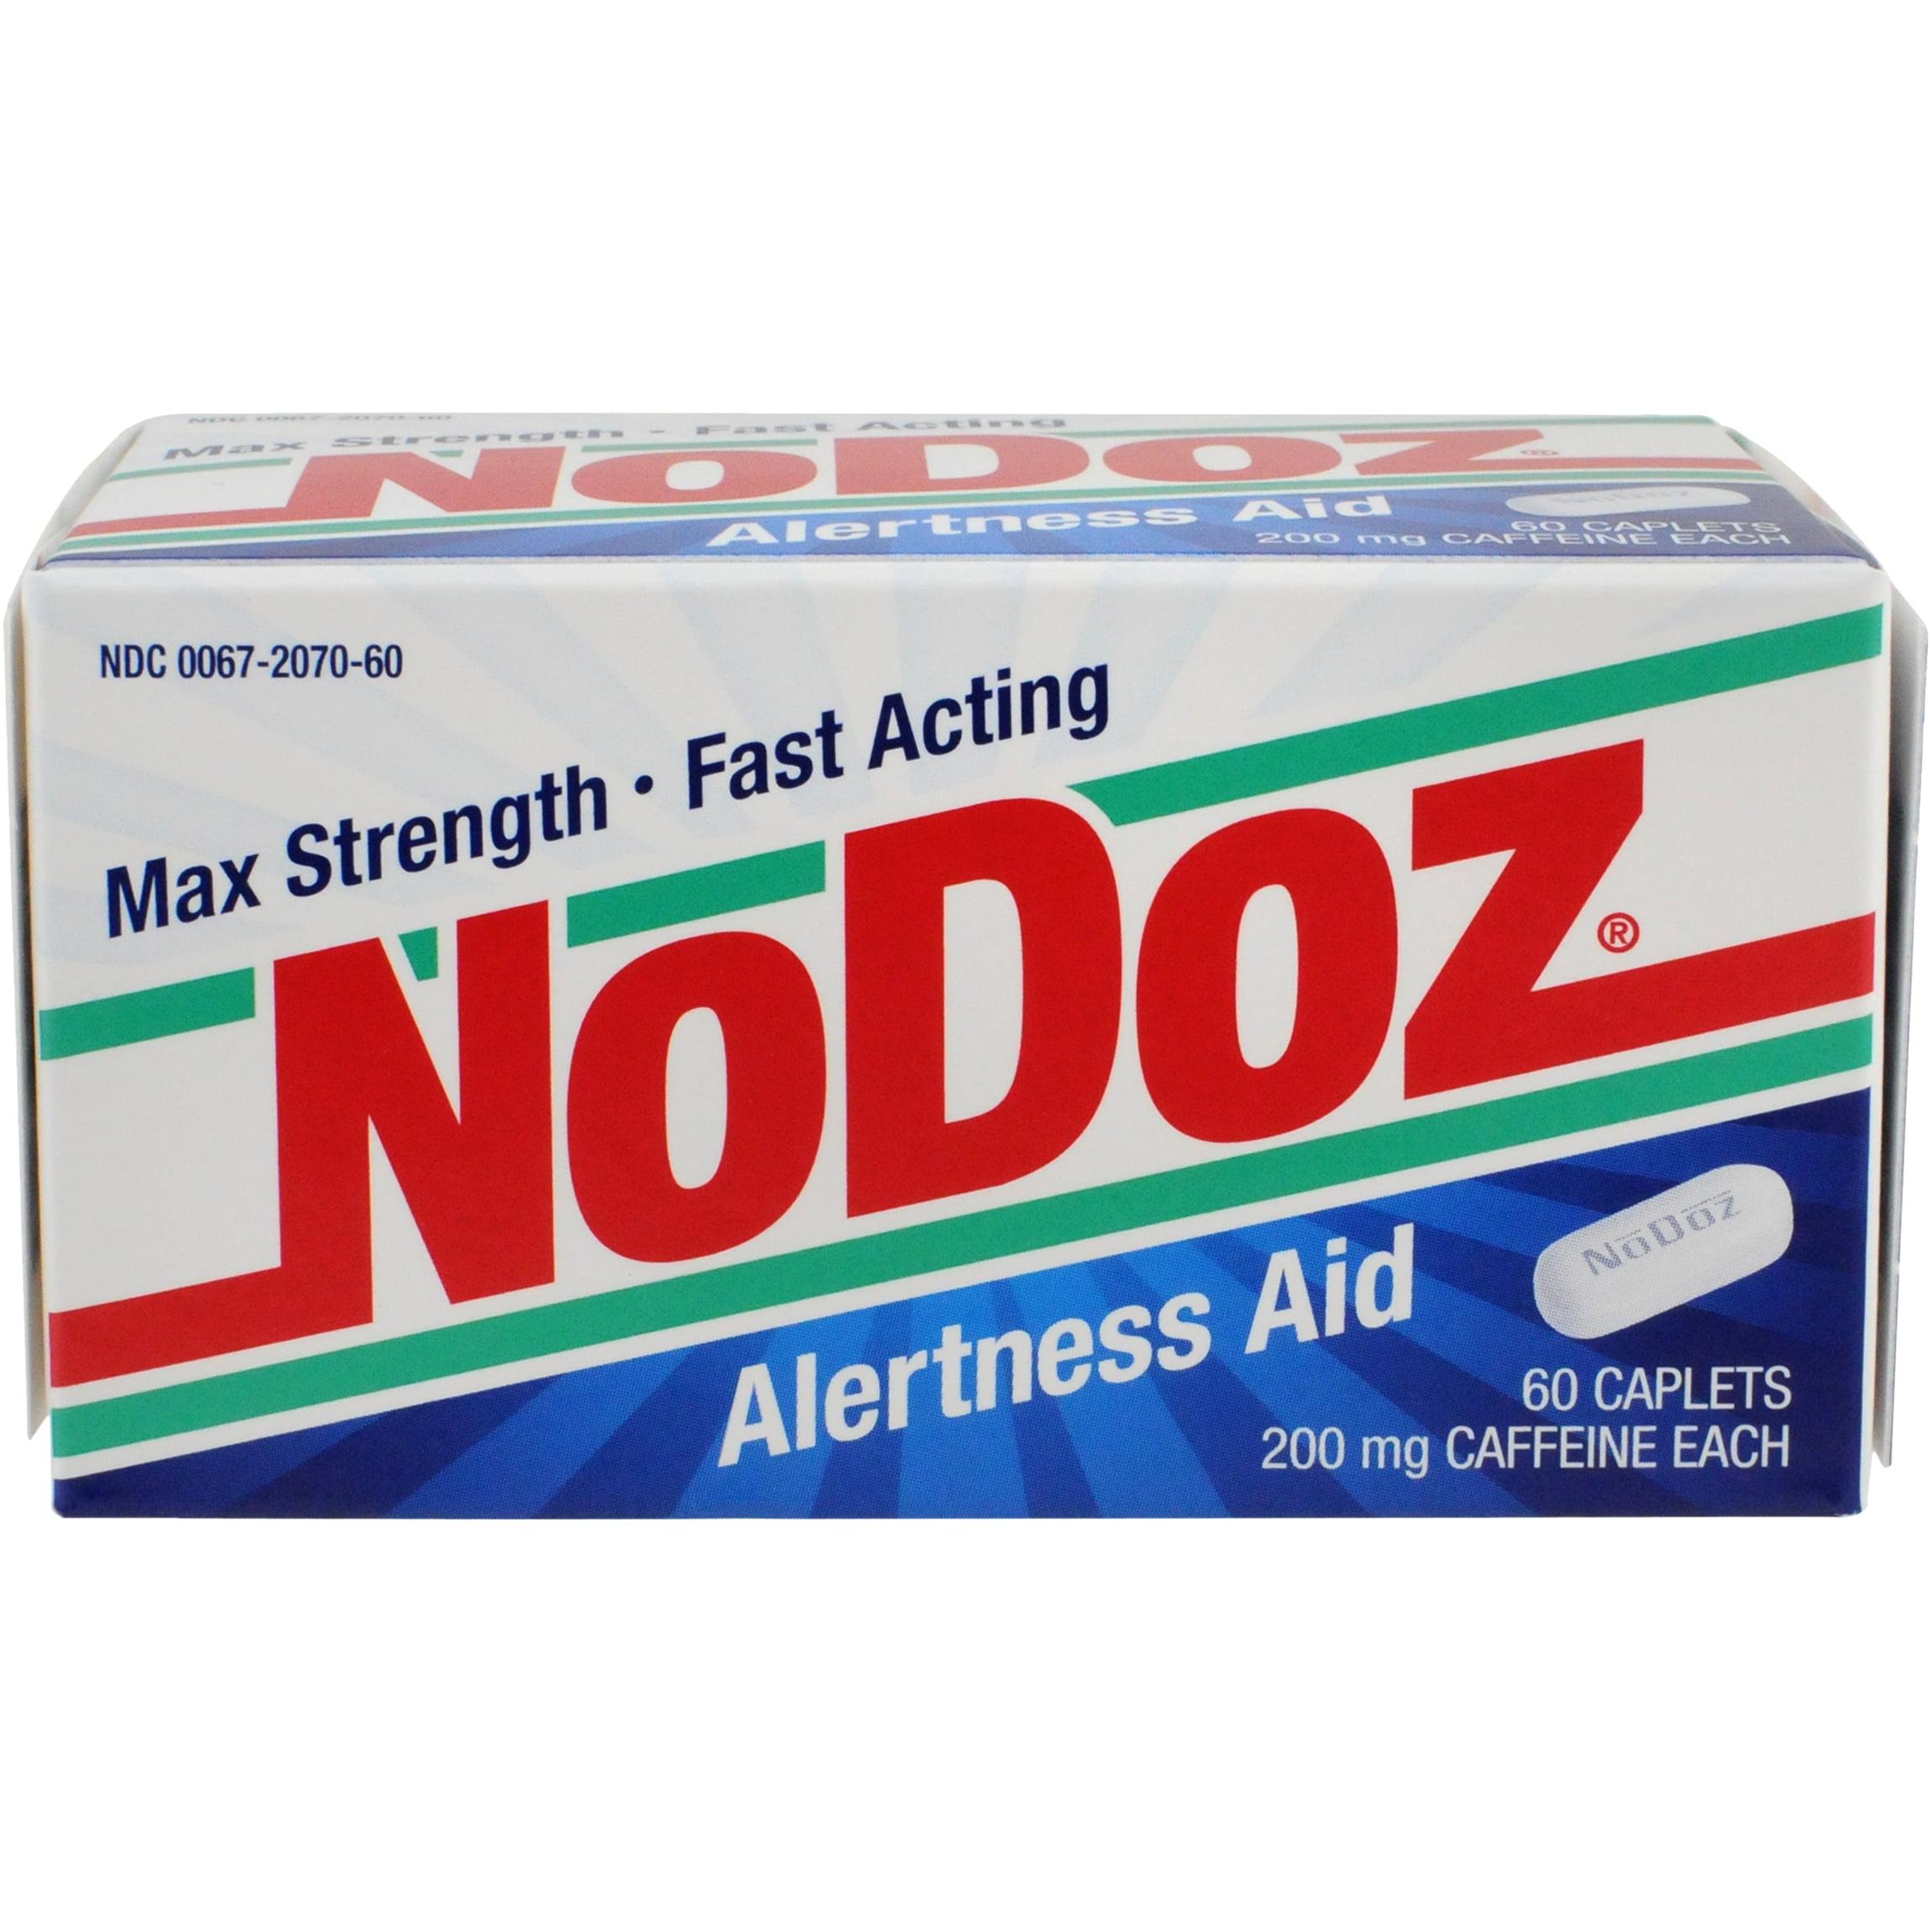 NoDoz Alertness Aid Caplets, 60 Ct